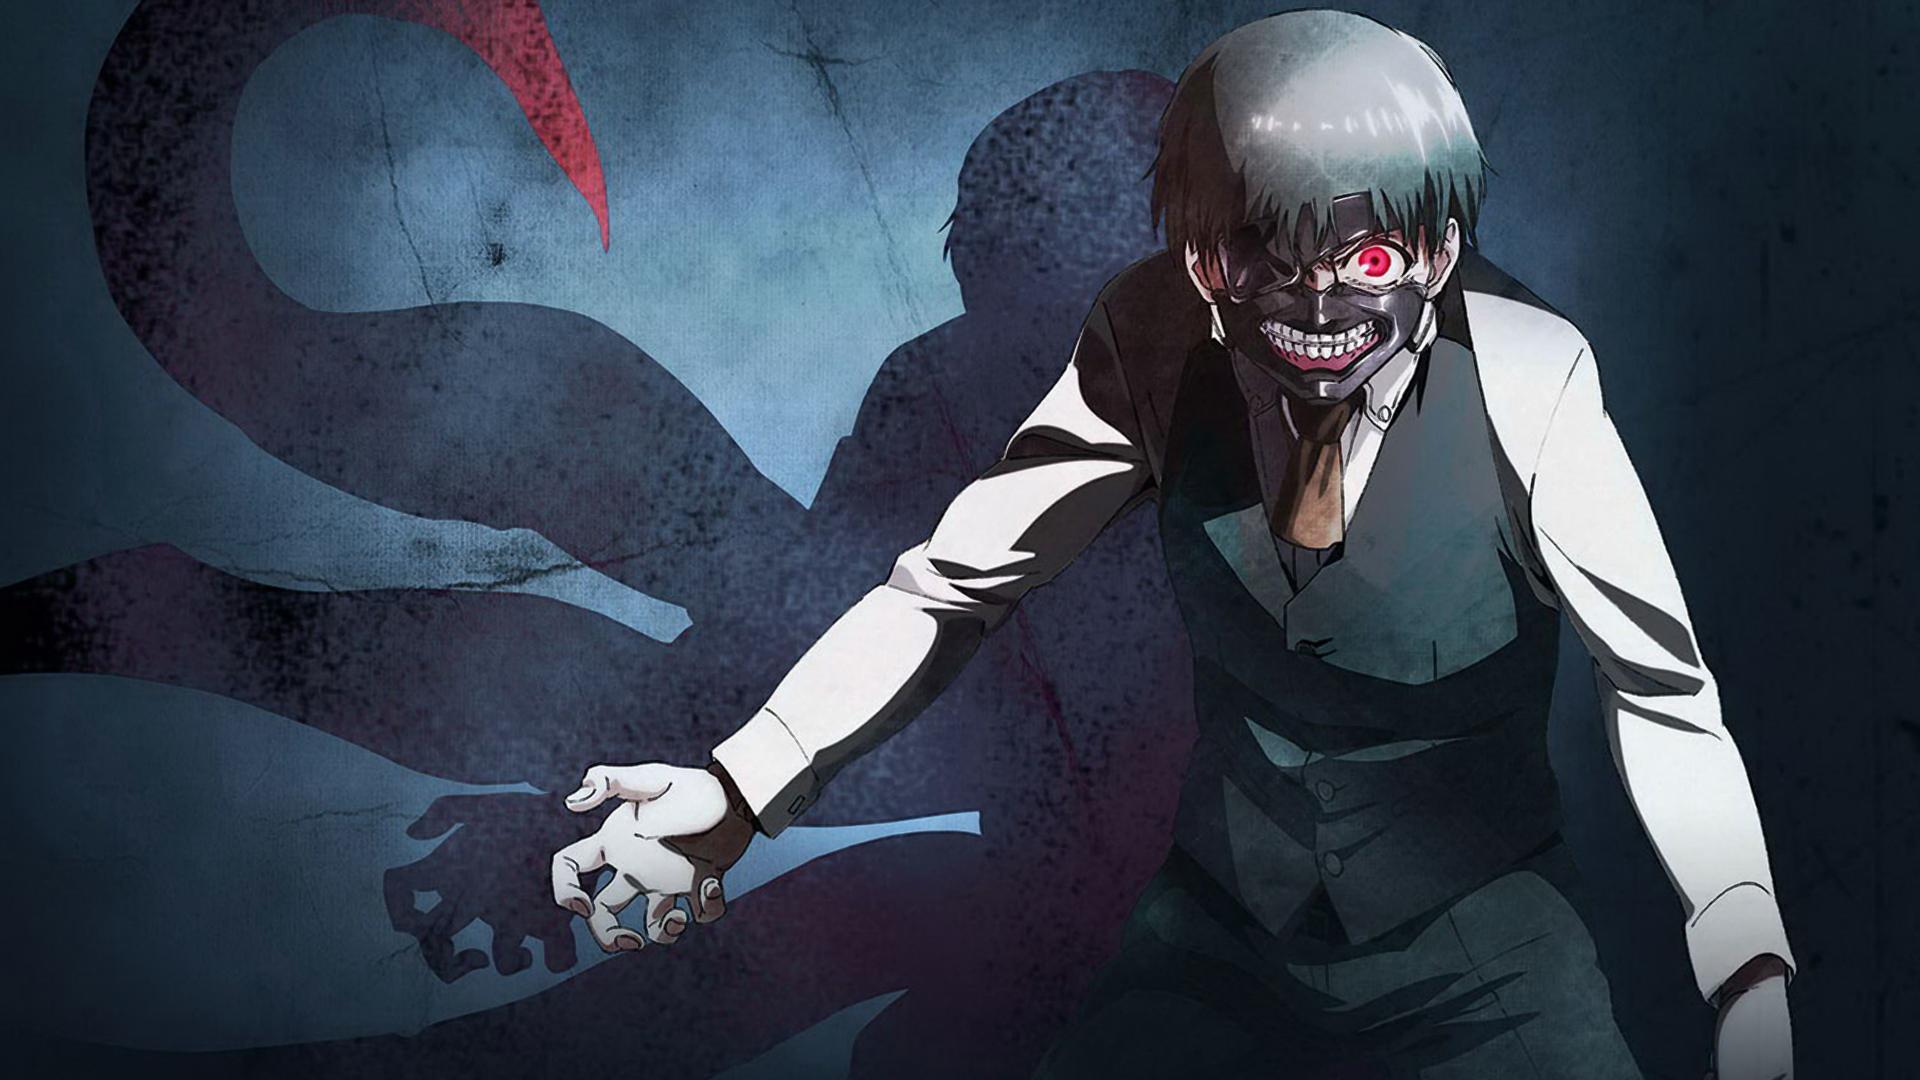 ken kaneki tokyo ghoul anime mask character hd 1920x1080 1080p and 1920x1080